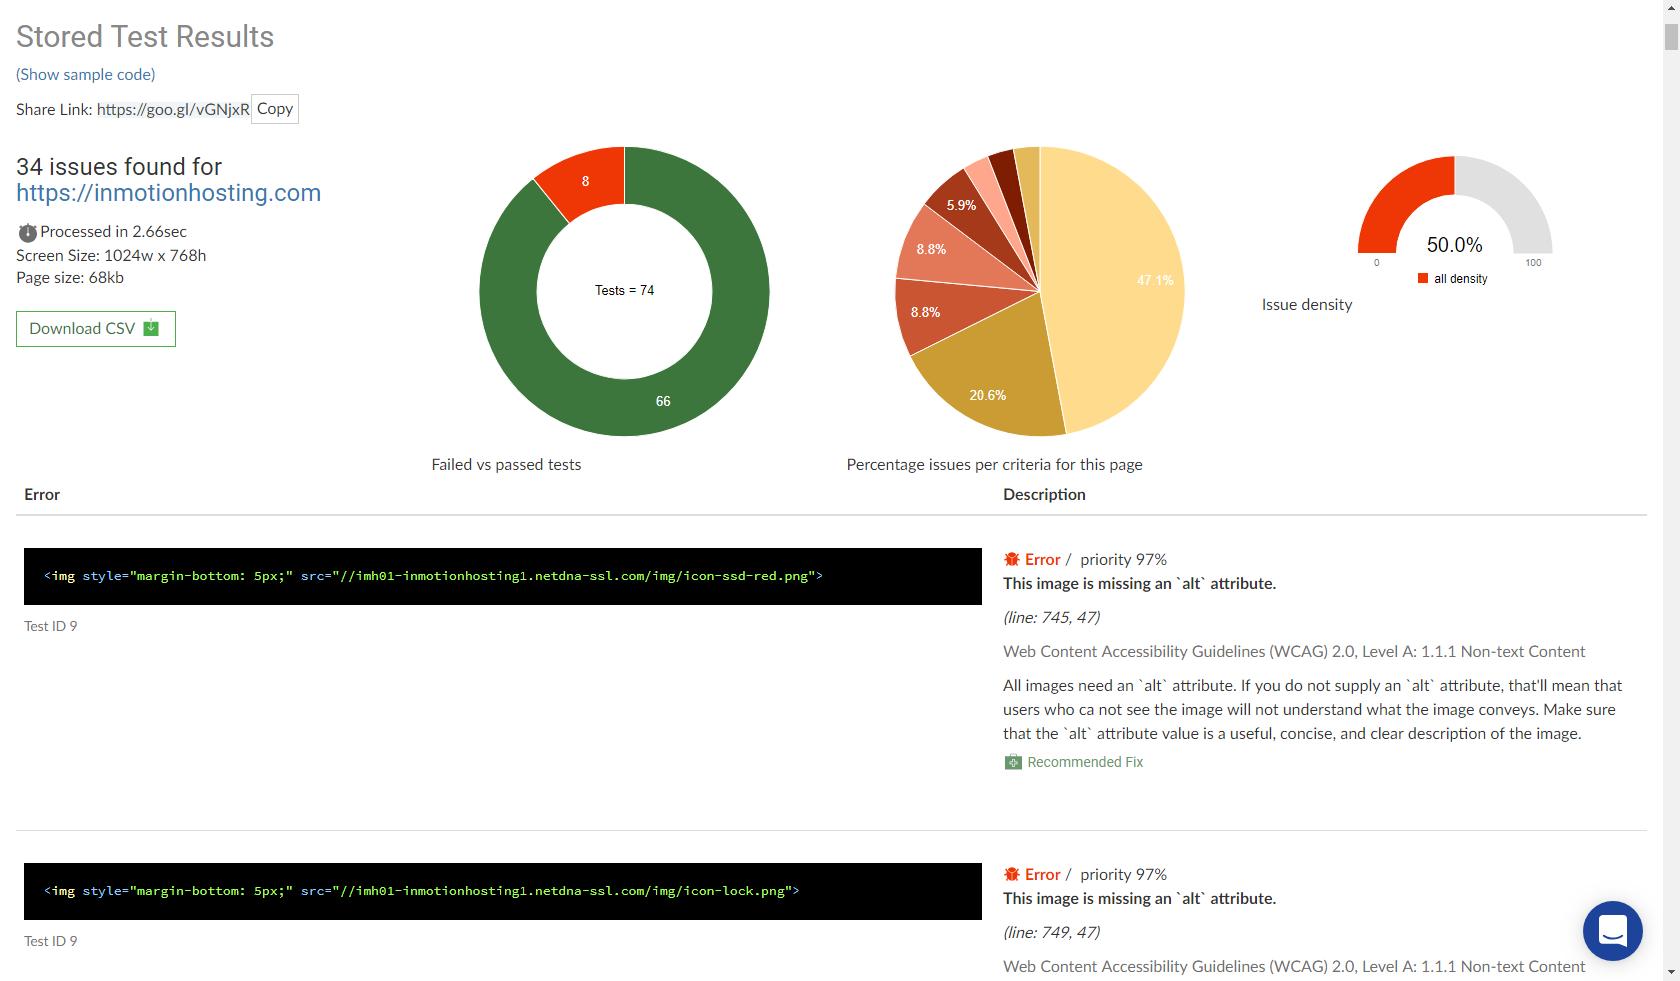 Scan results for inmotionhosting.com